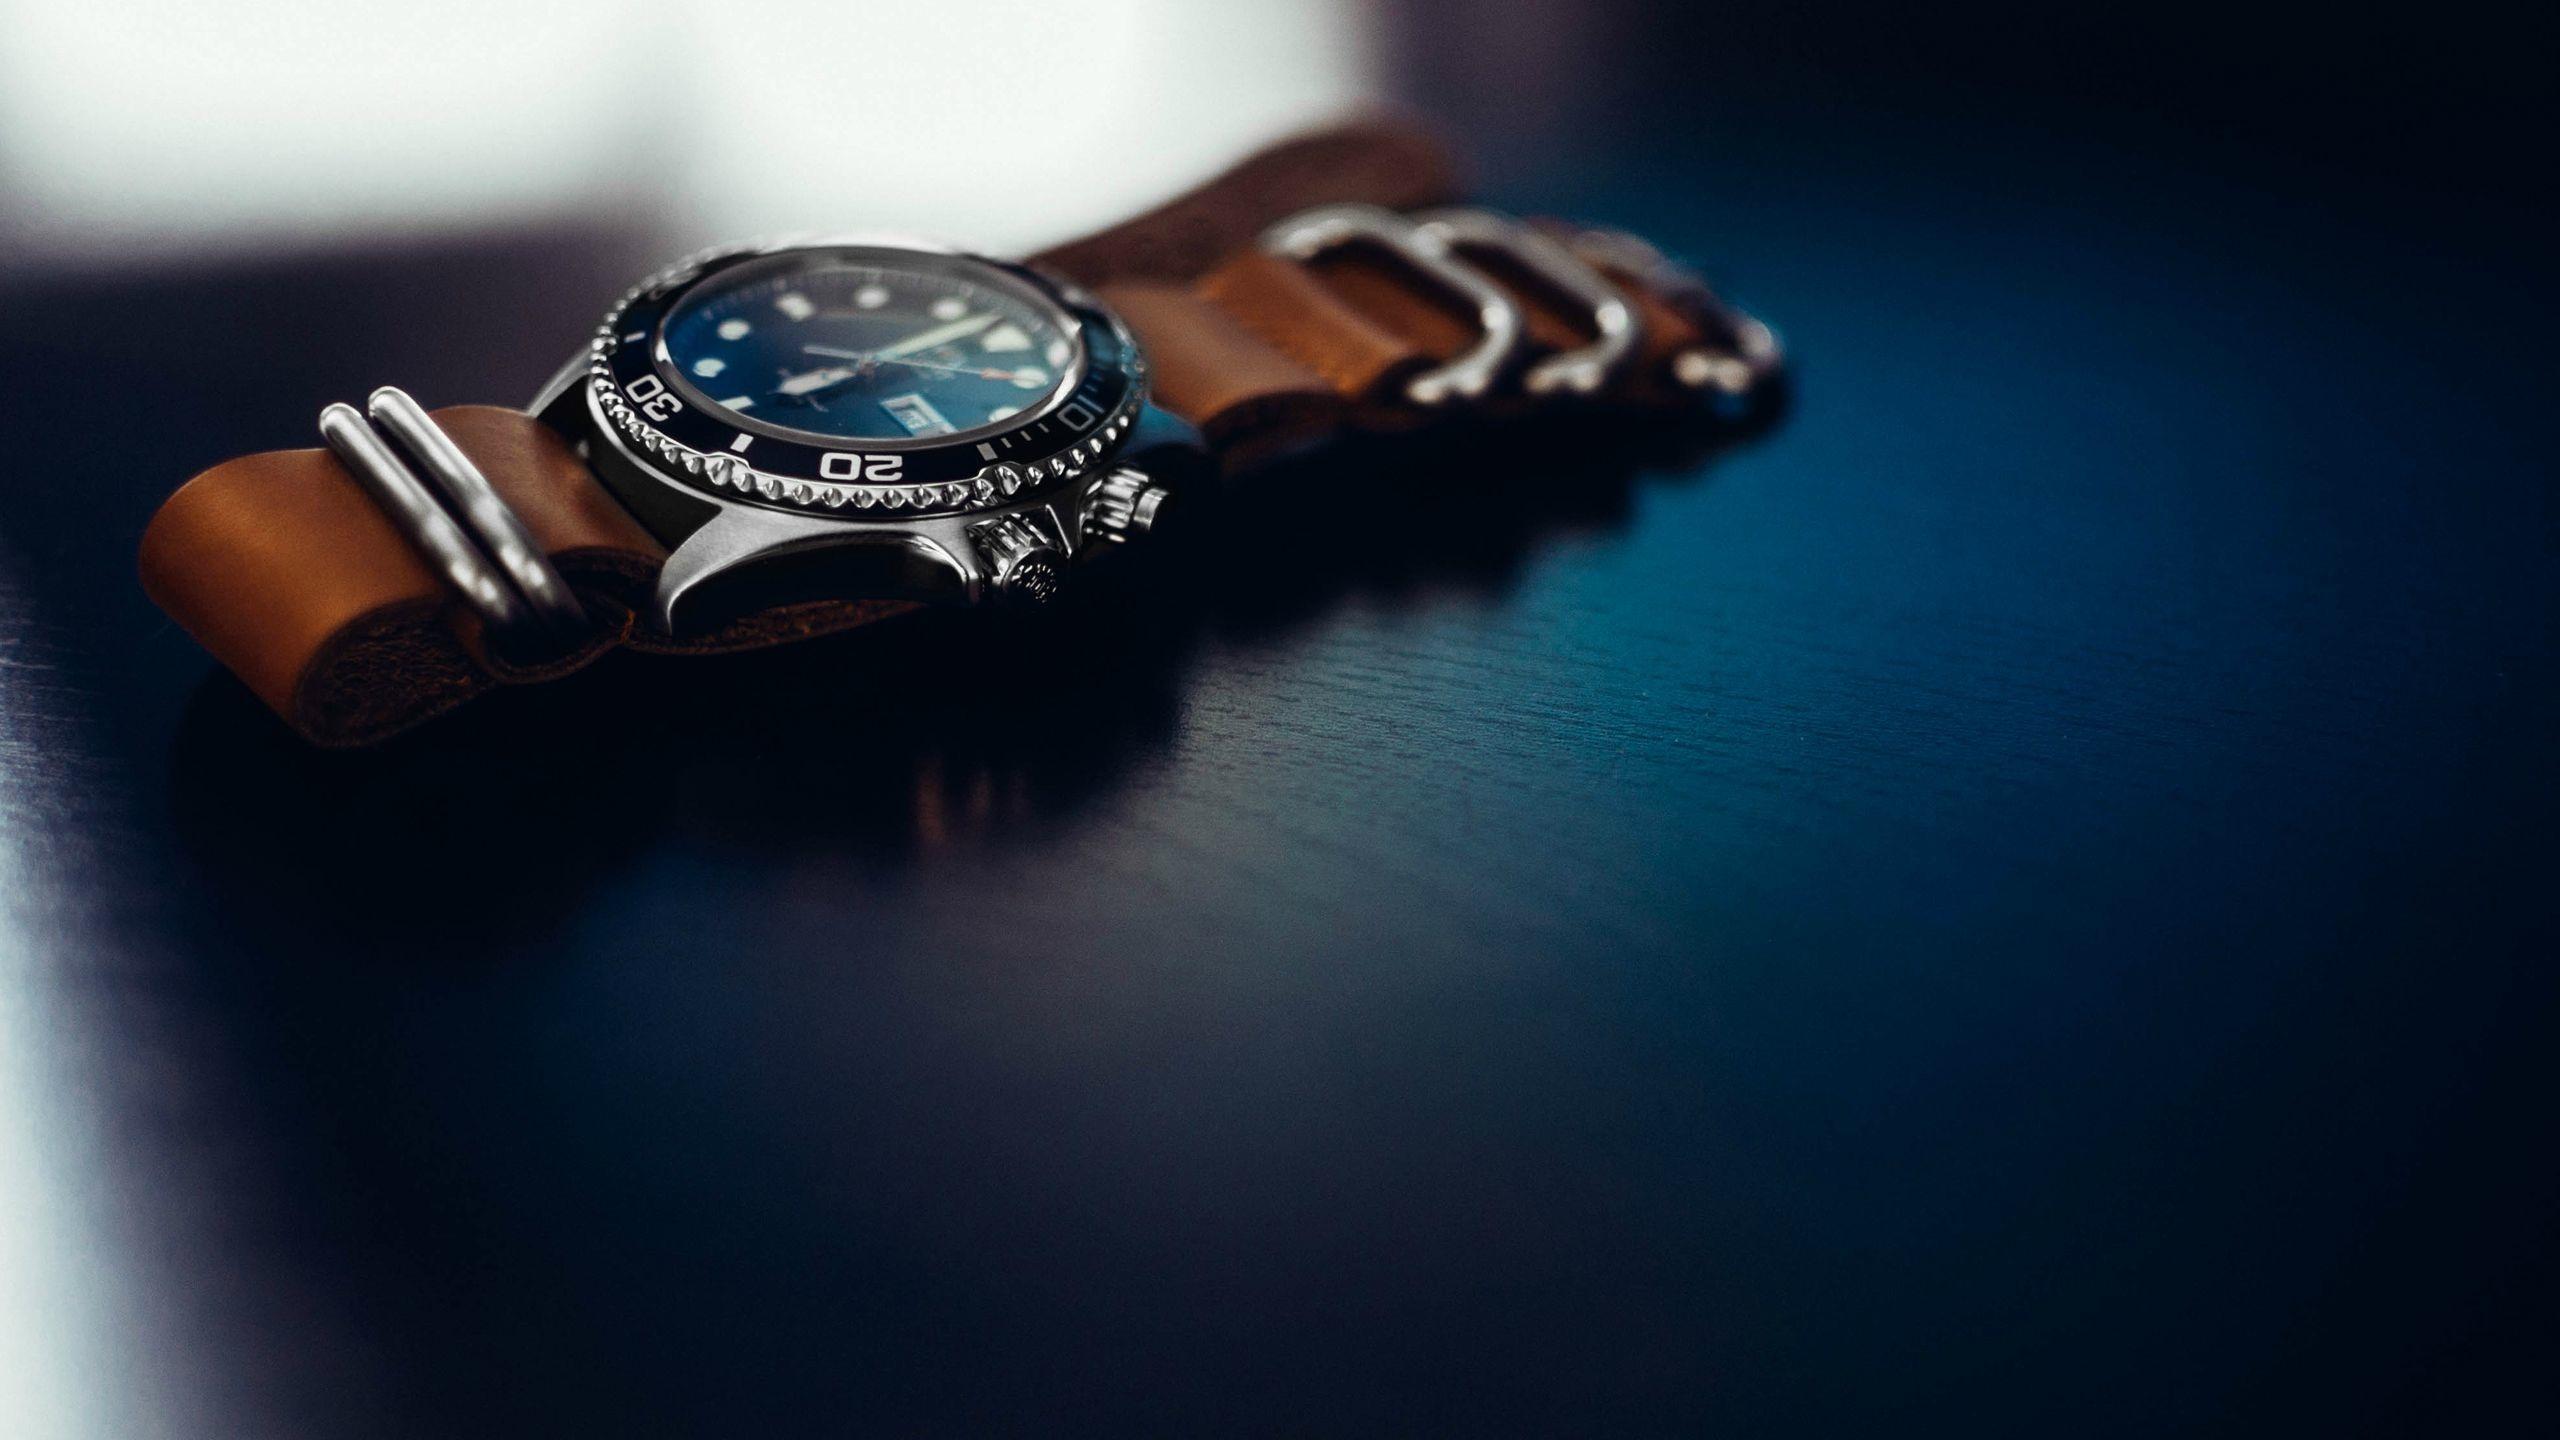 Fotos gratis : reloj, mano, anillo, dedo, azul, joyería, Fotografía ...